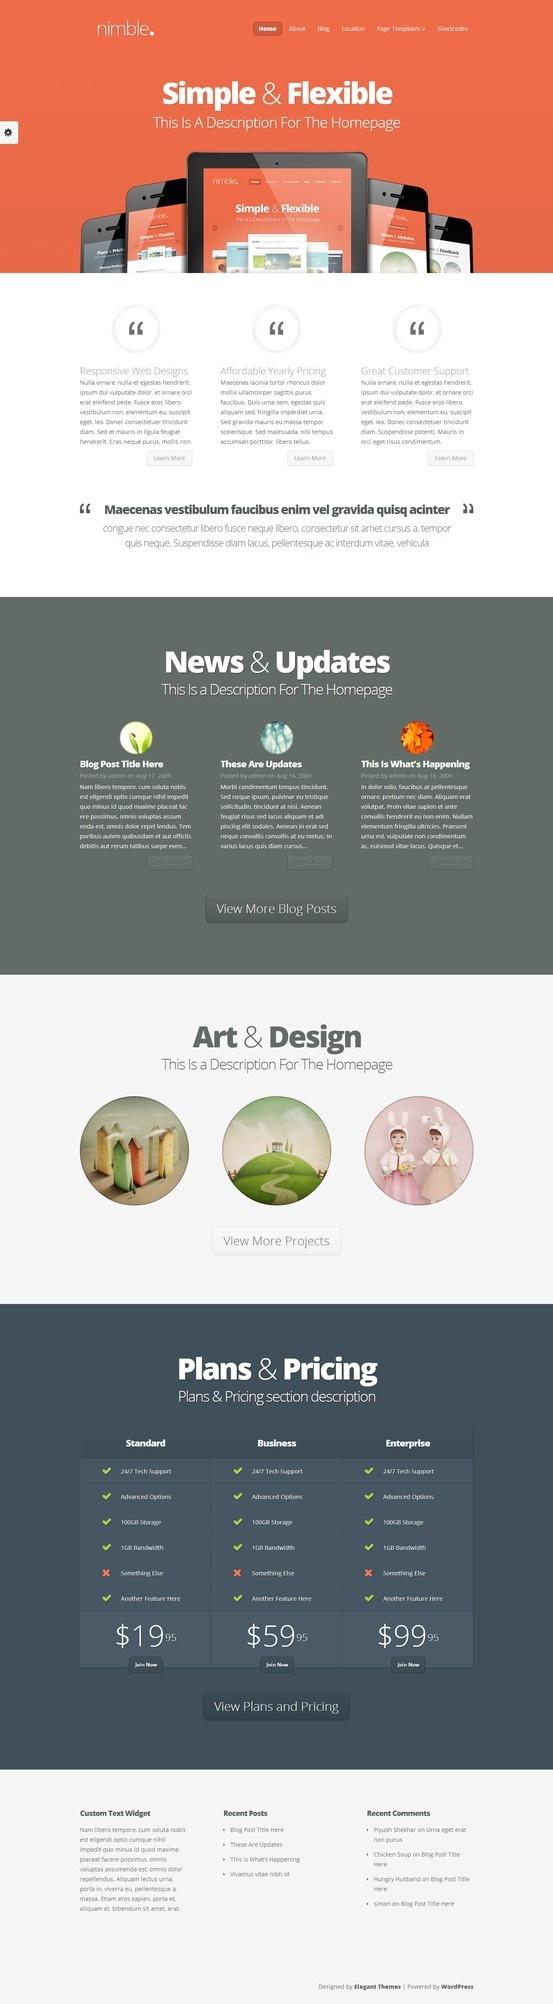 Nimble WordPress Theme http://www.elegantthemes.com/affiliates/idevaffiliate.php?id=20259=http://www.elegantthemes.com/gallery/nimble/ #wordpress #blog #theme